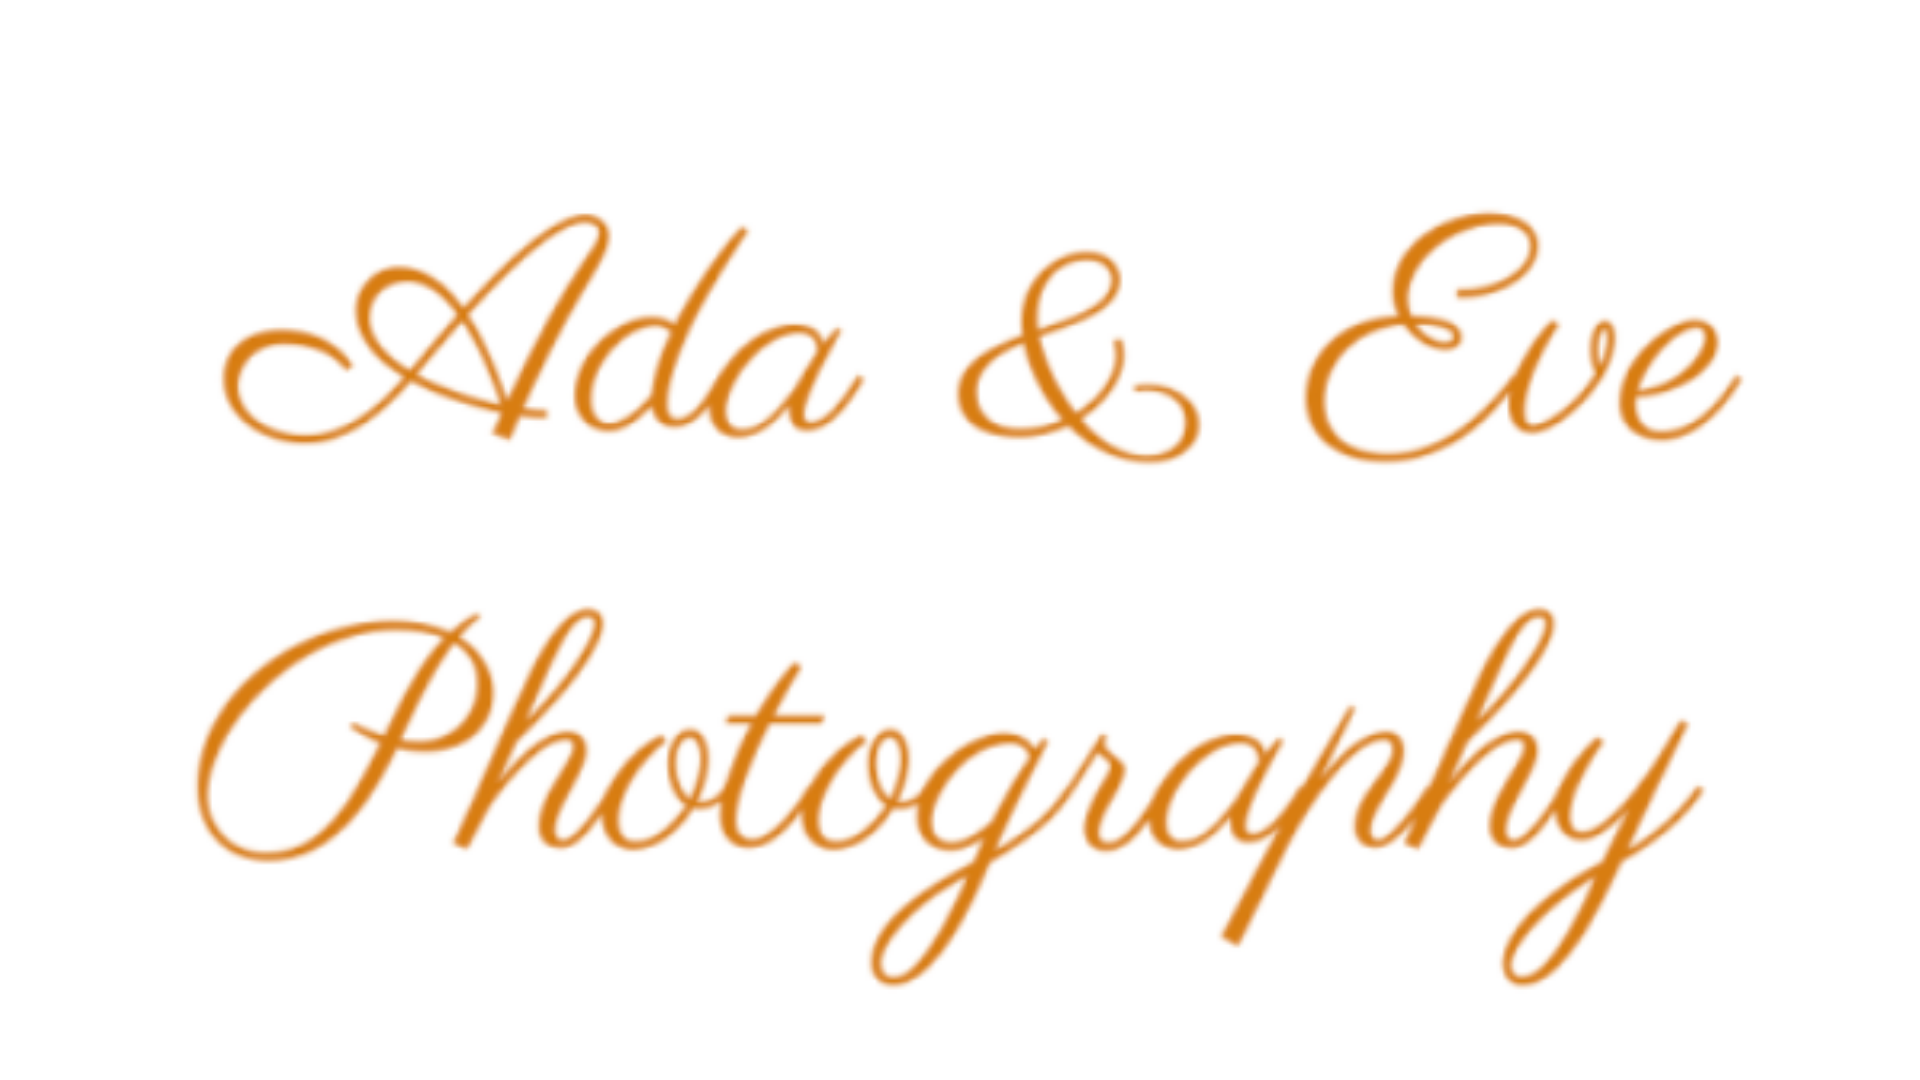 Ada & Eve Photography